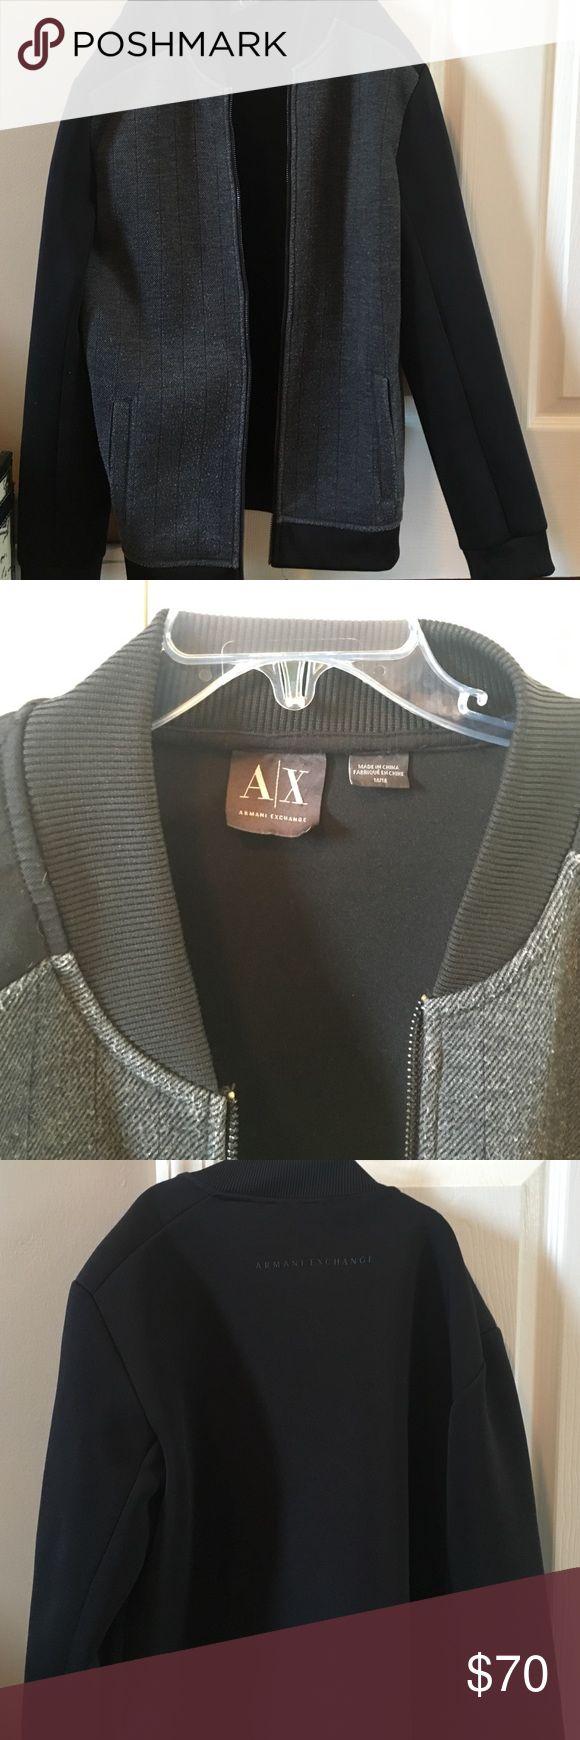 Men's Armani Exchange coat Men's Armani Exchange coat. Medium. Looks brand new. Fitted arm/sleeves. 2 external pockets Armani Exchange Jackets & Coats